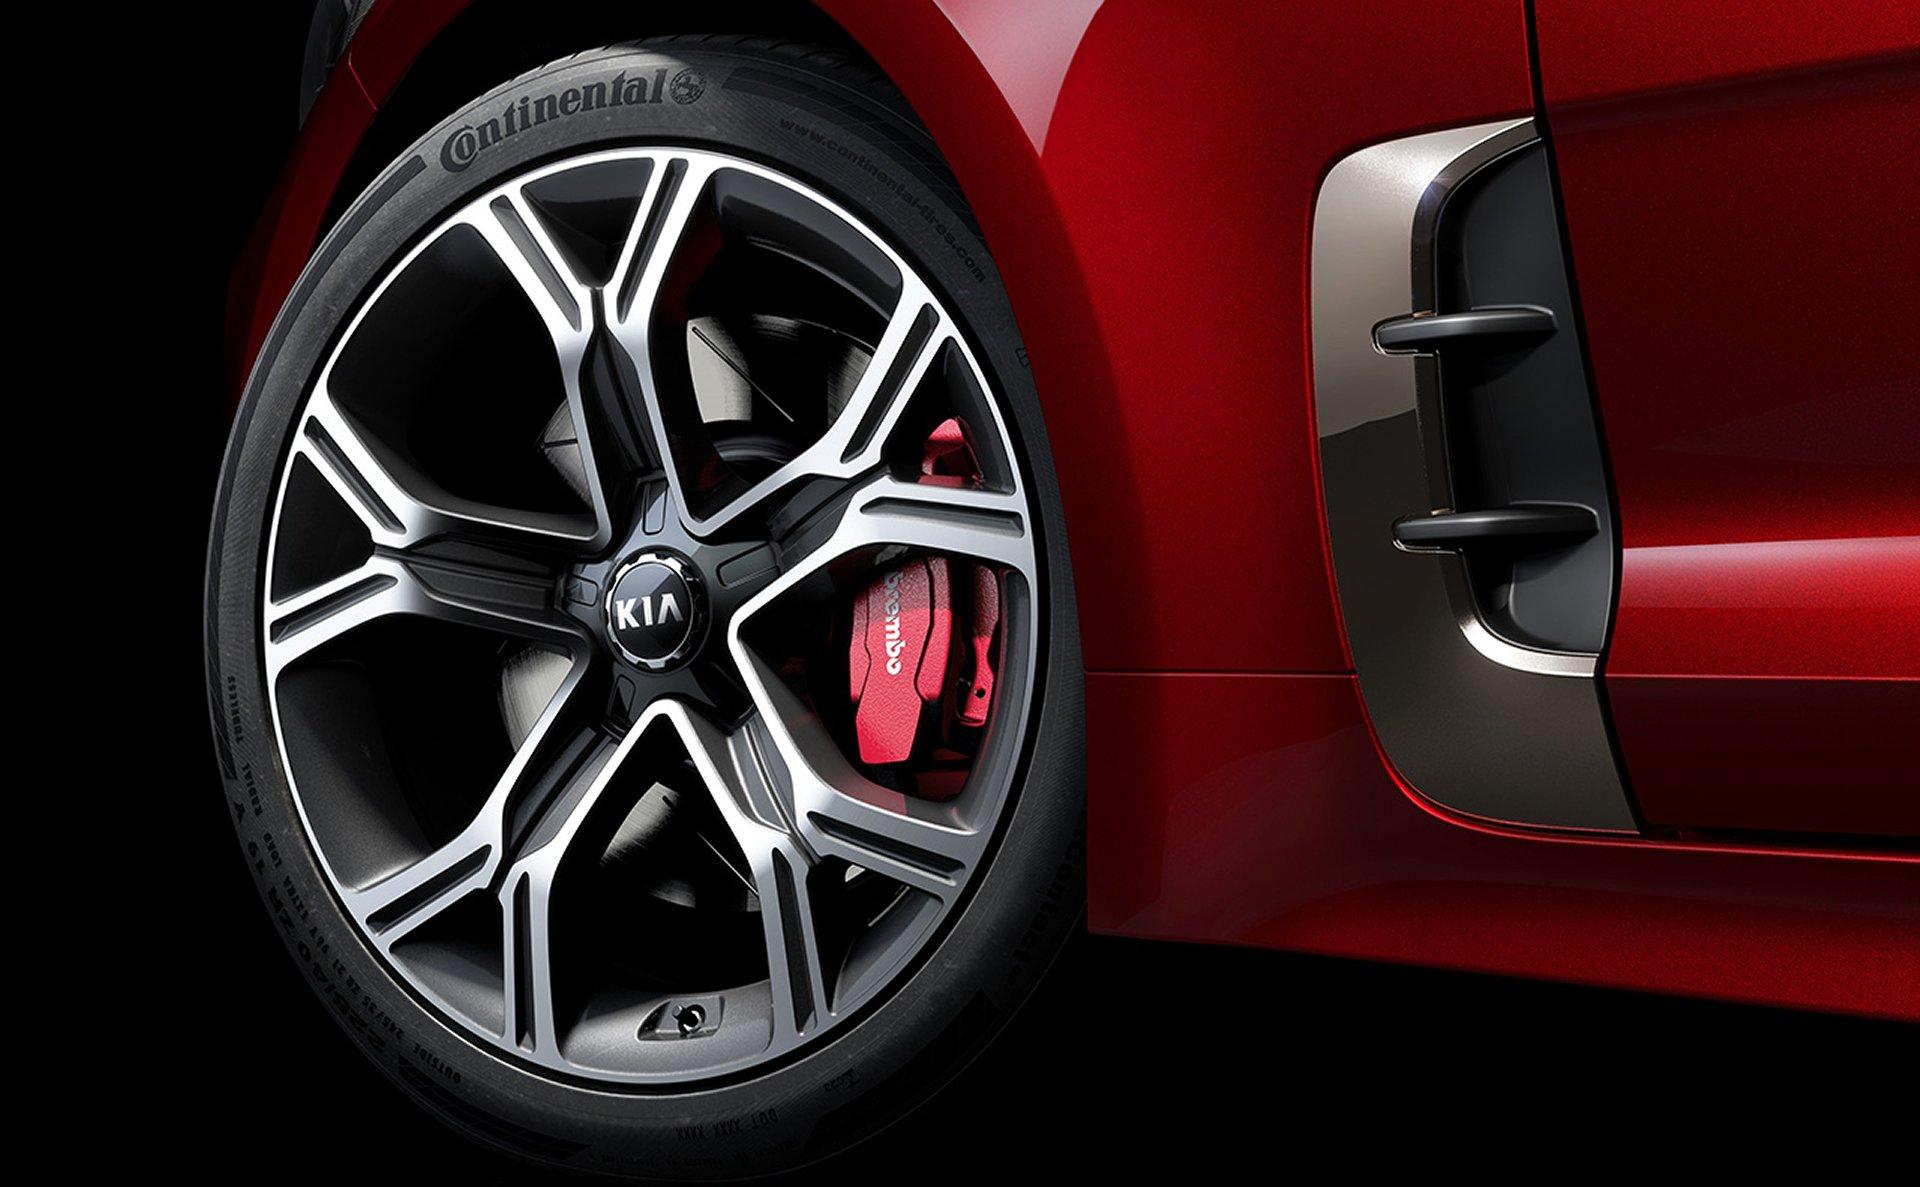 Kia Stinger Lease Finance Deals Fairfield Oh Oem Audi Wheels Database Image1